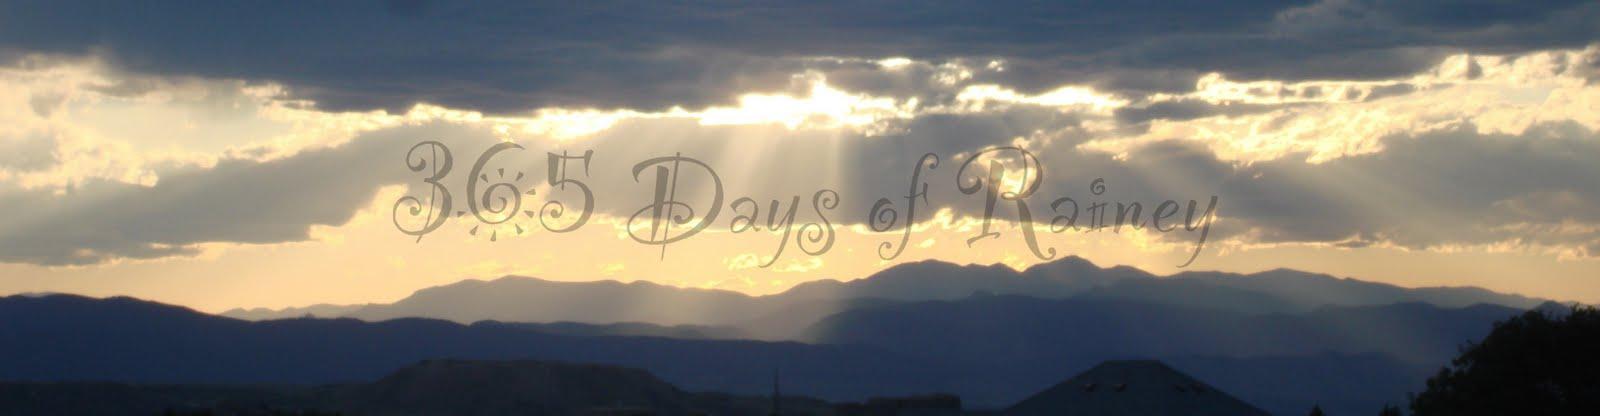 365 days of Rainey